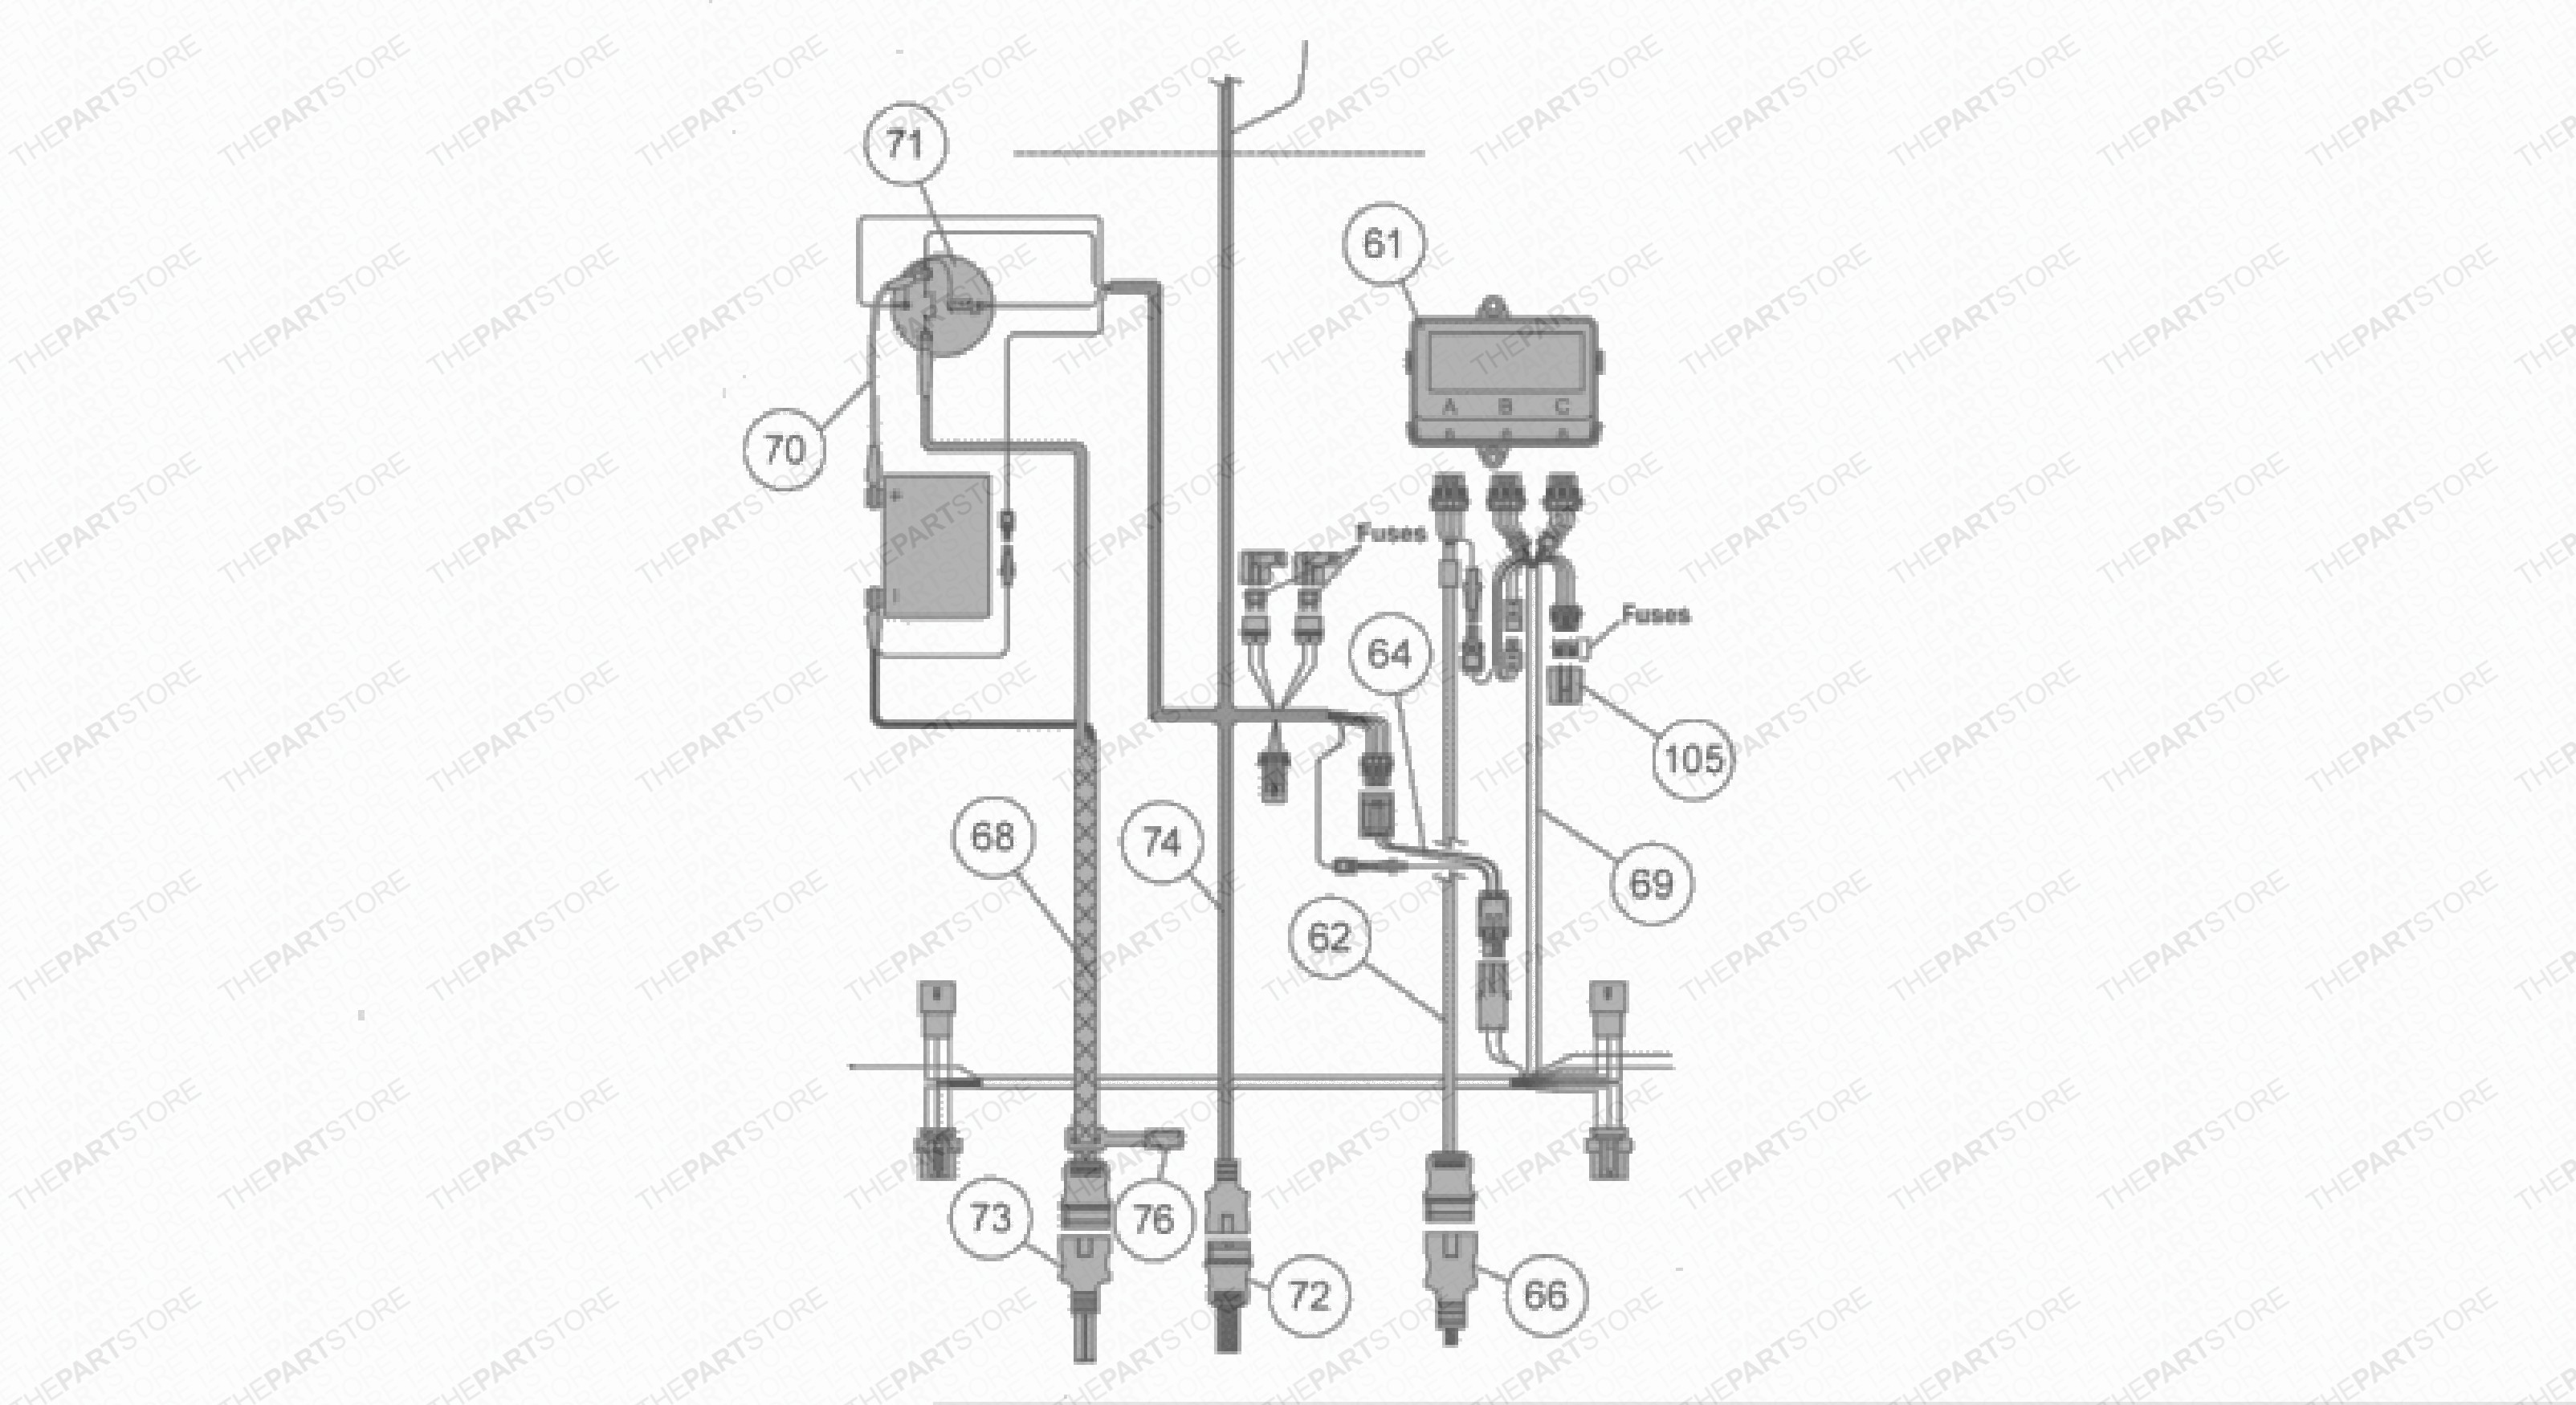 Boss Snow Plow Wiring Diagram Luxury Boss 8 2 Rt2 Wiring Diagram Boss Snow Plow Light